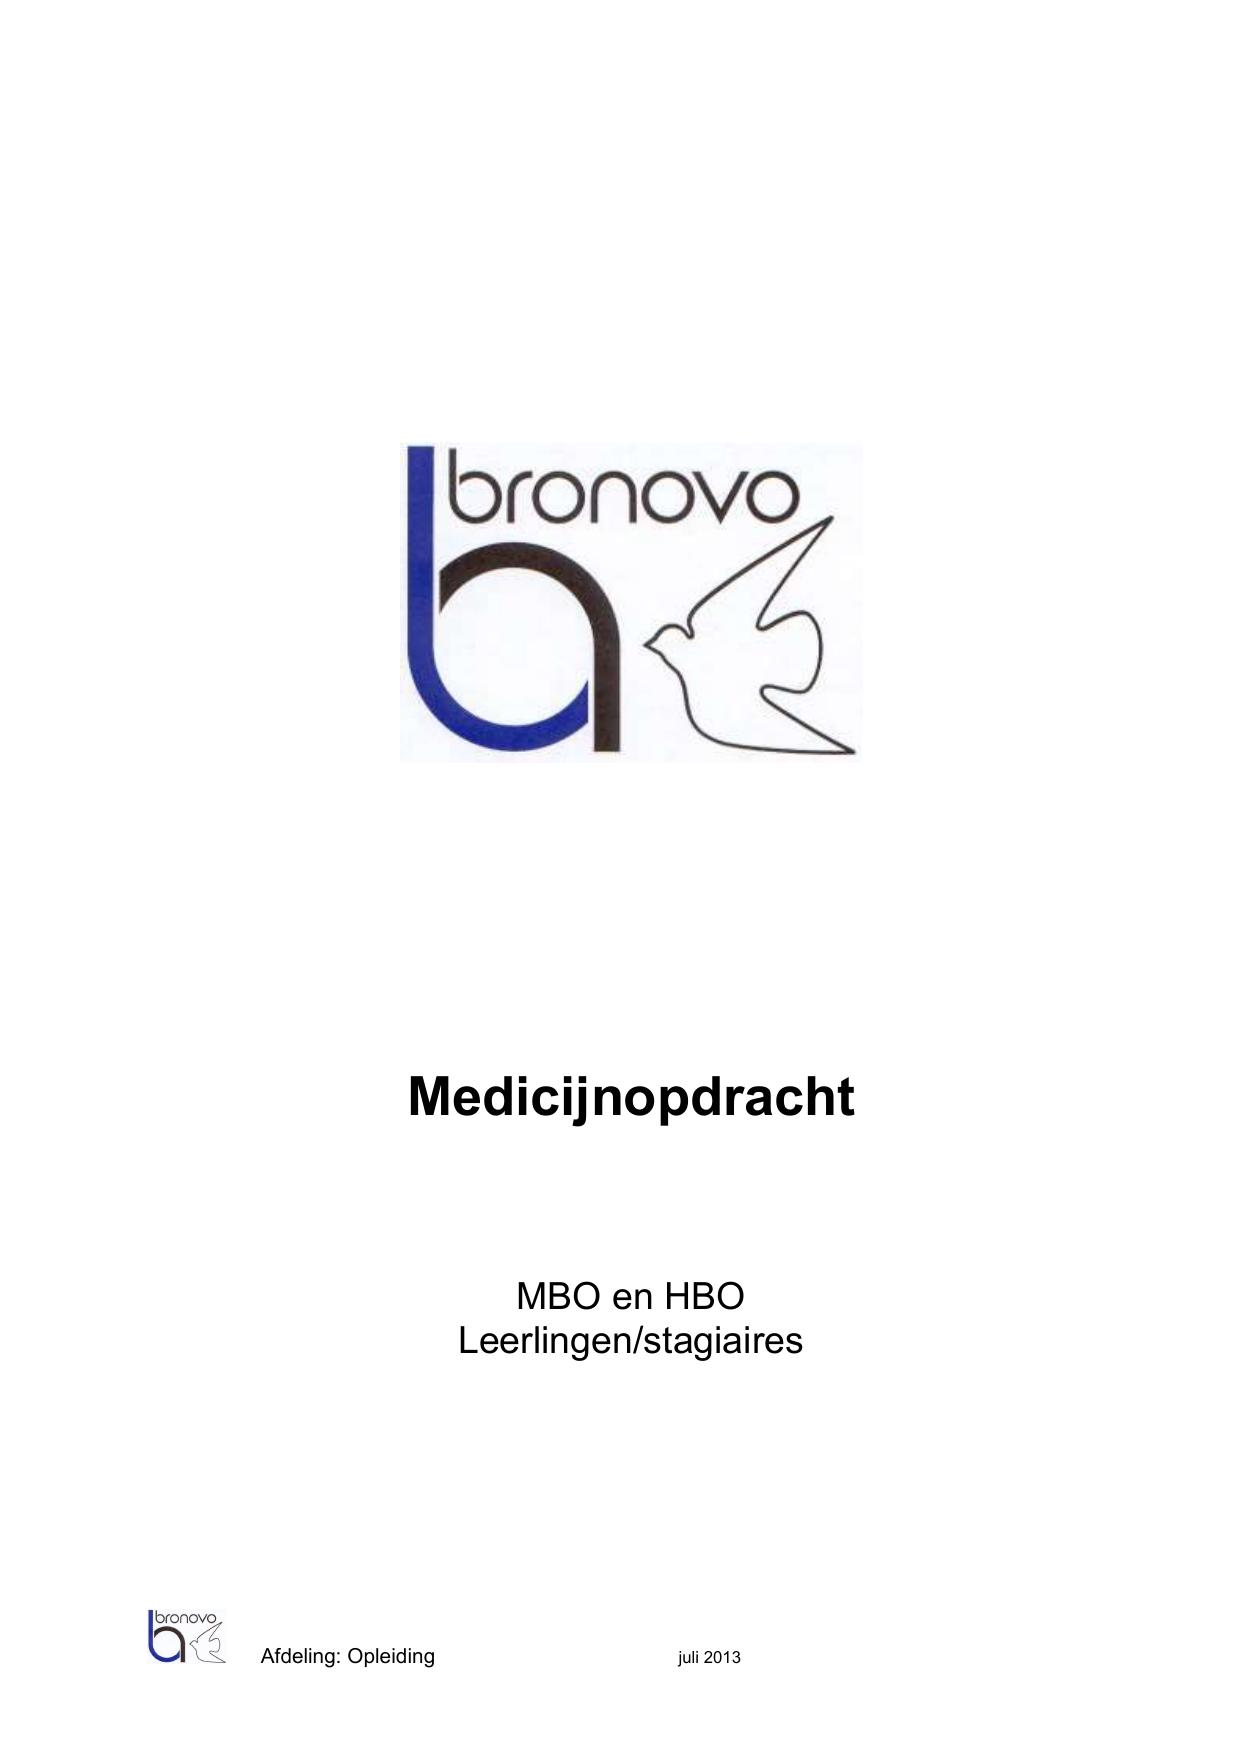 oplossen amoxicilline intra intramusculaire